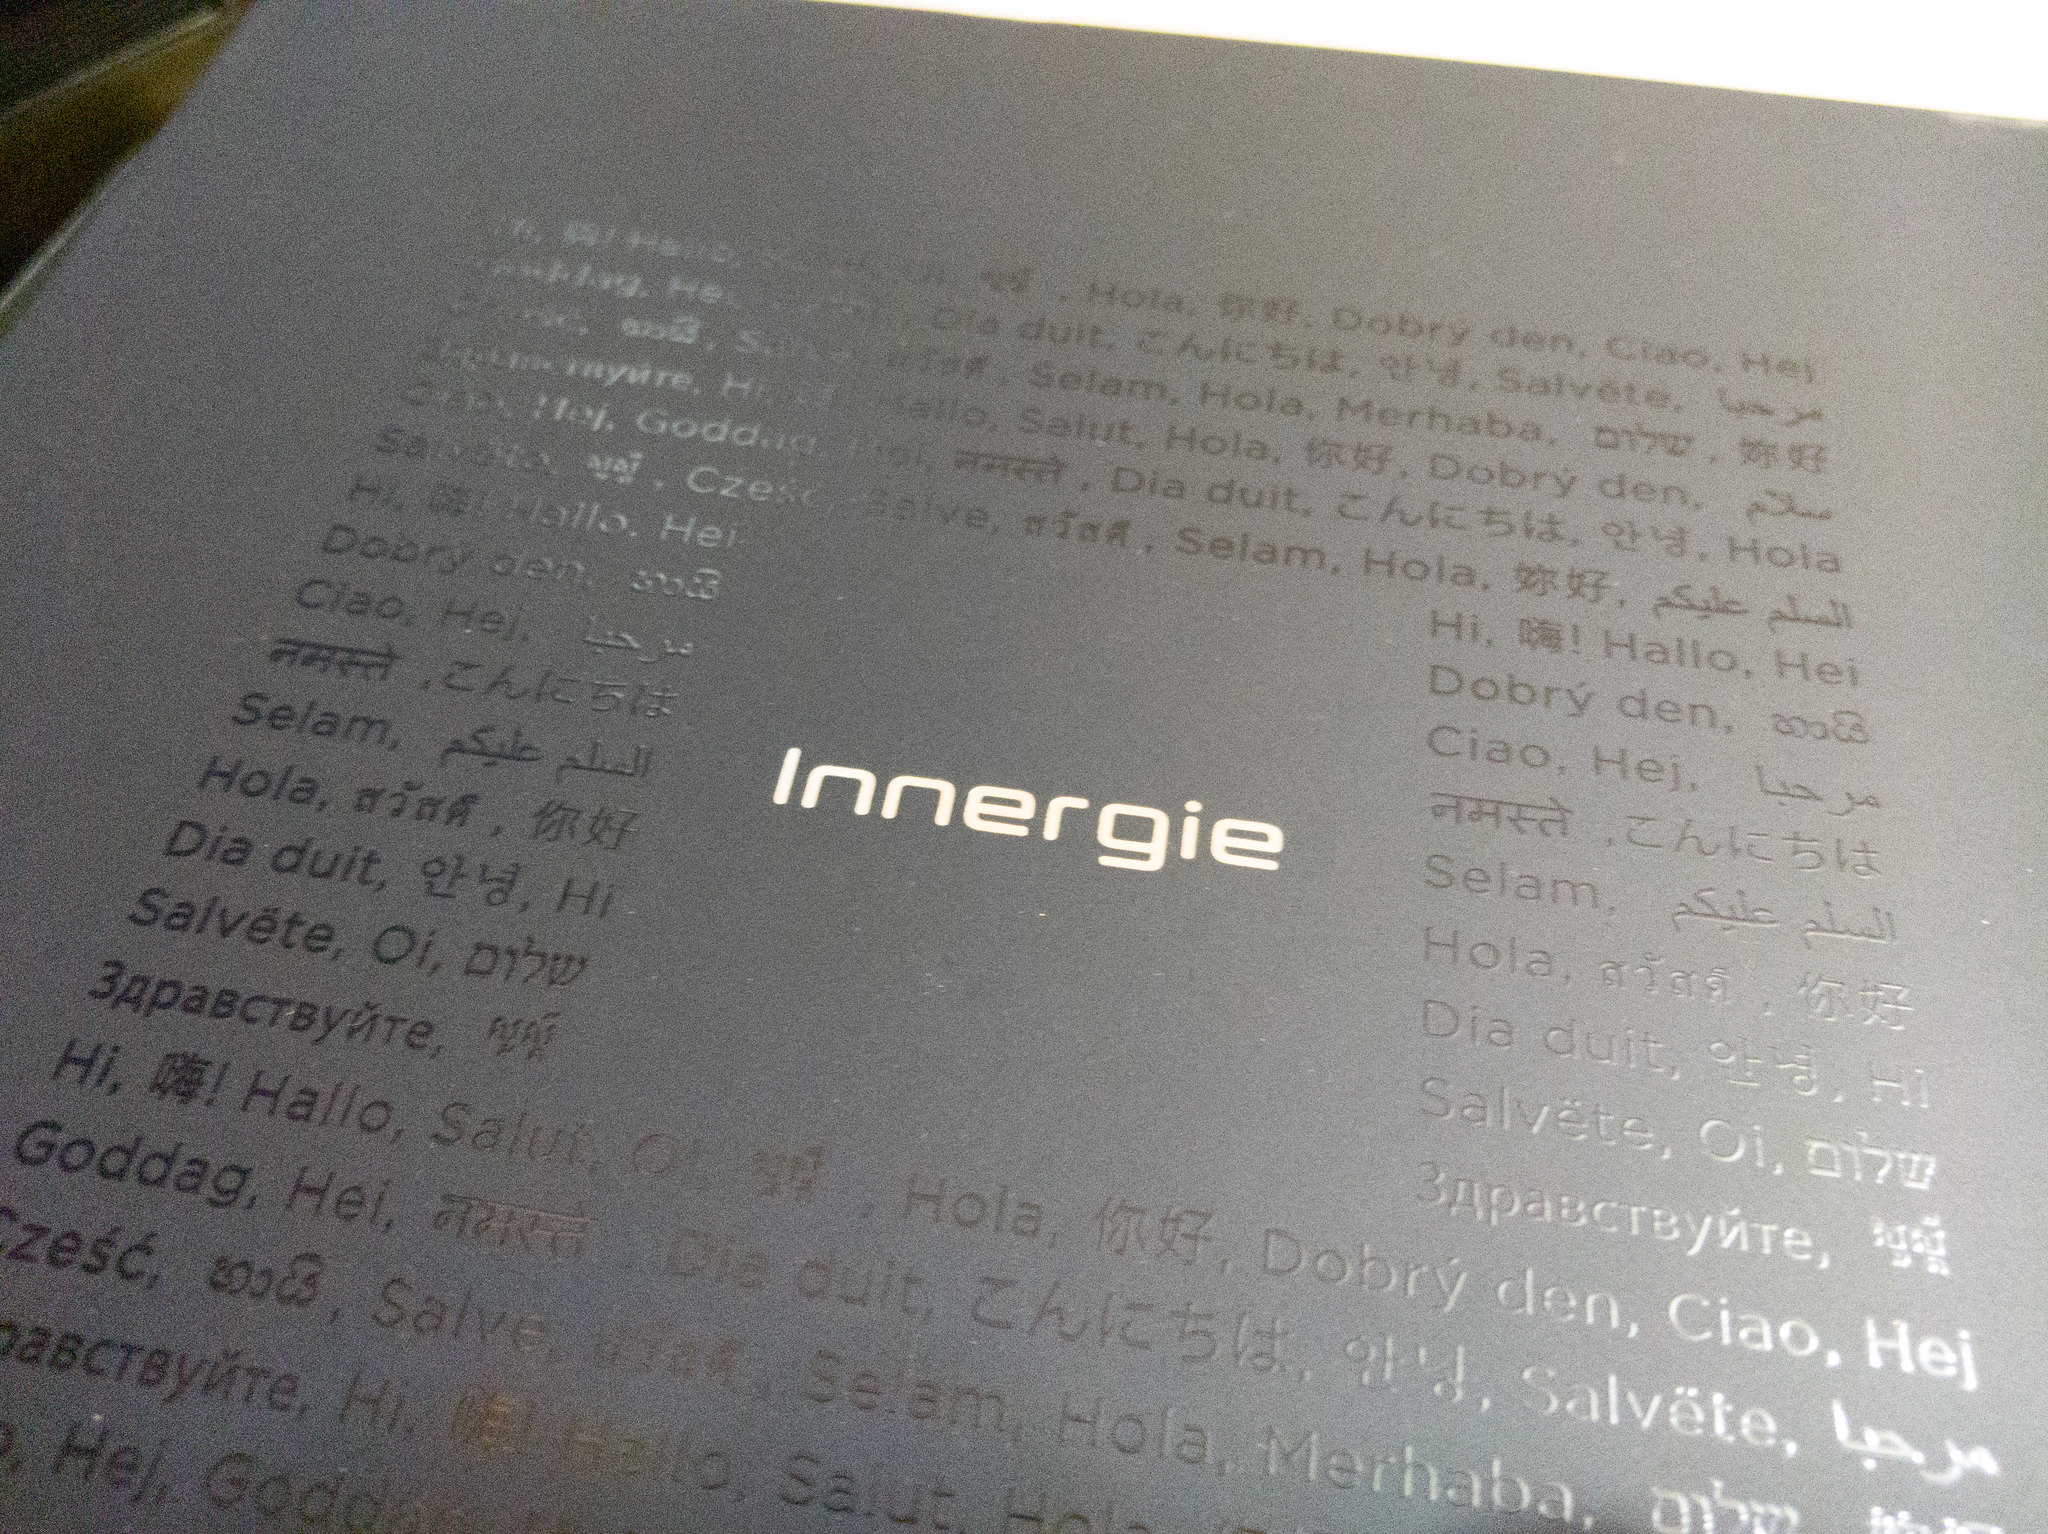 IMAG0251